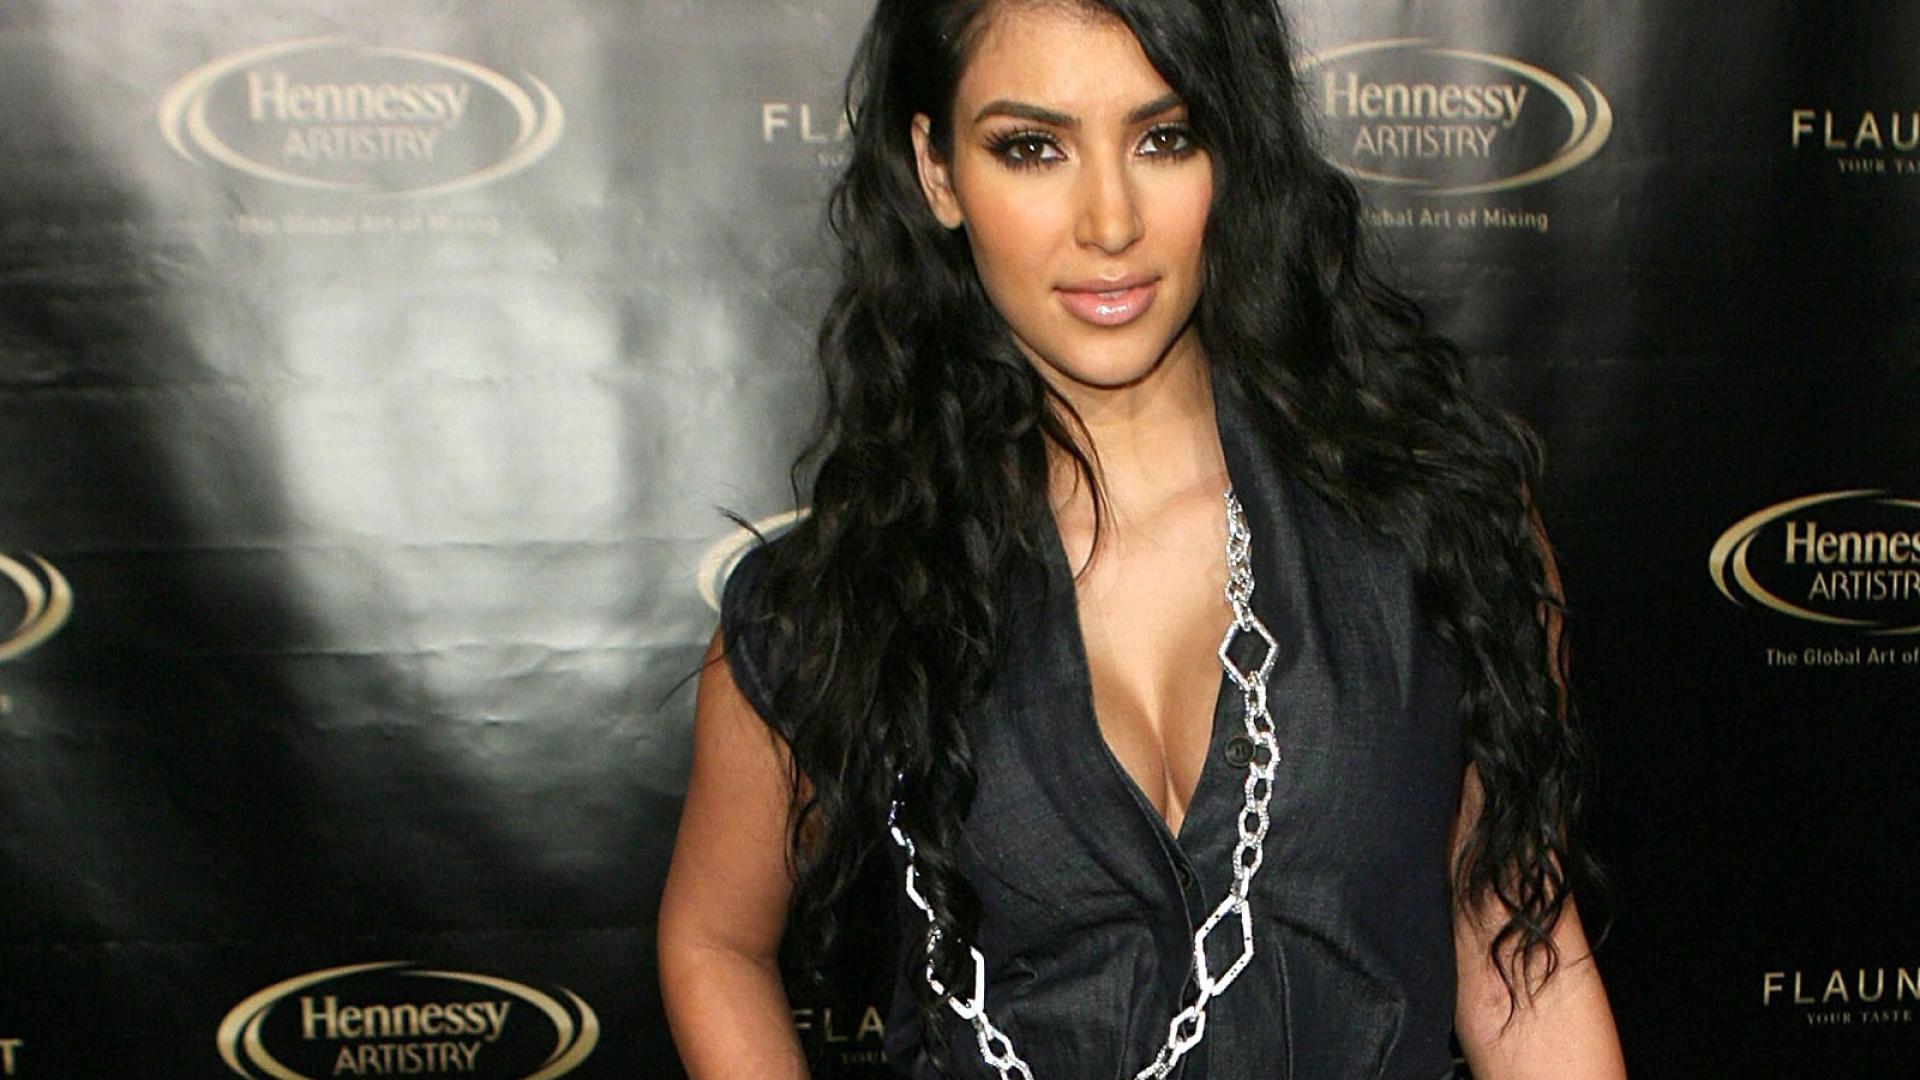 1920x1080 Kim Kardashian Hot Photos 1080p Laptop Full Hd